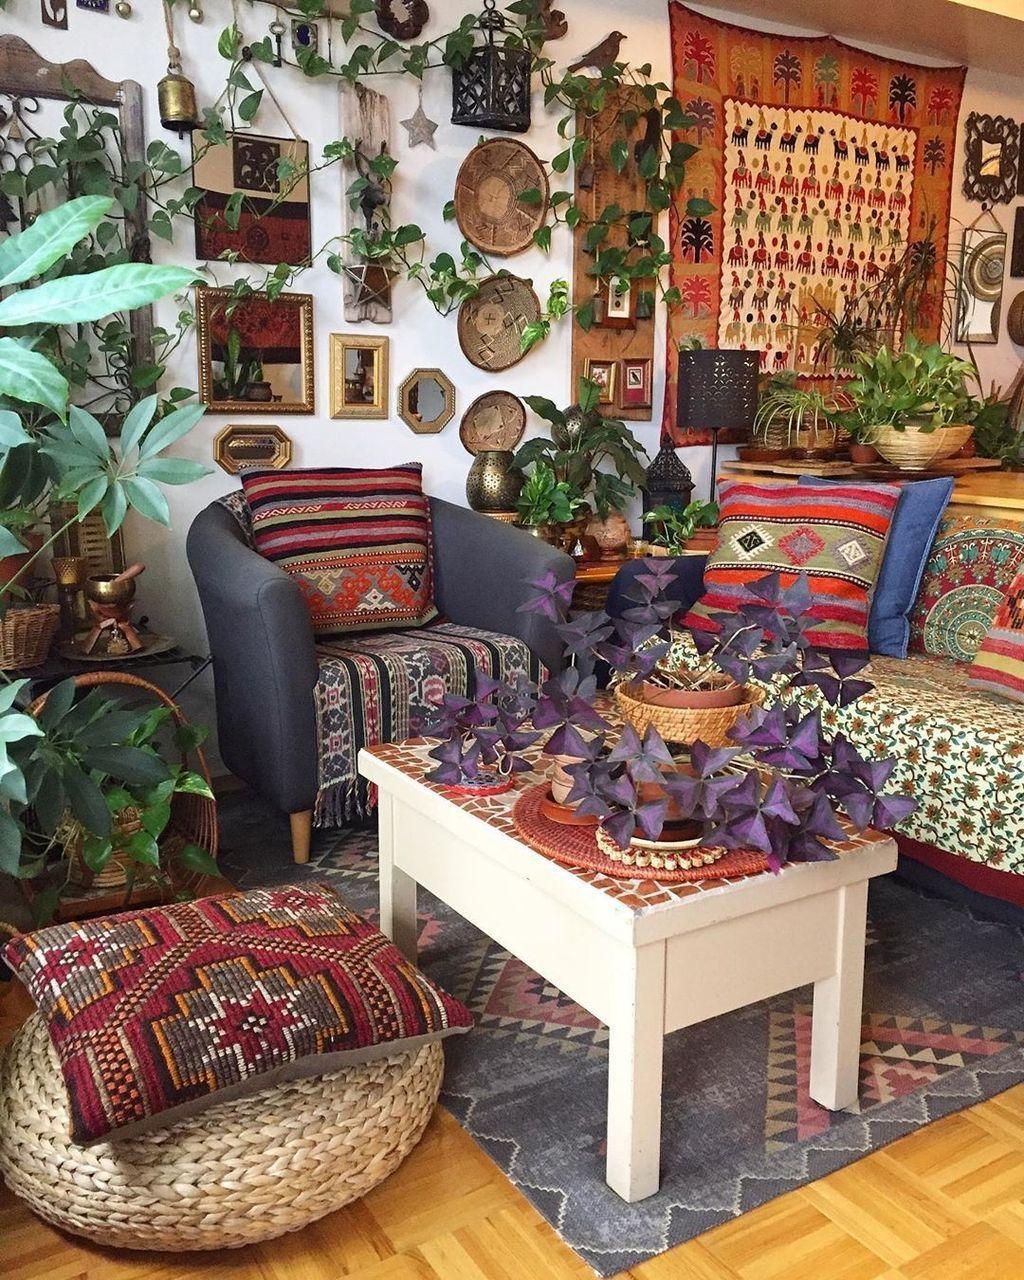 Pin On Roomies Gypsy living room ideas